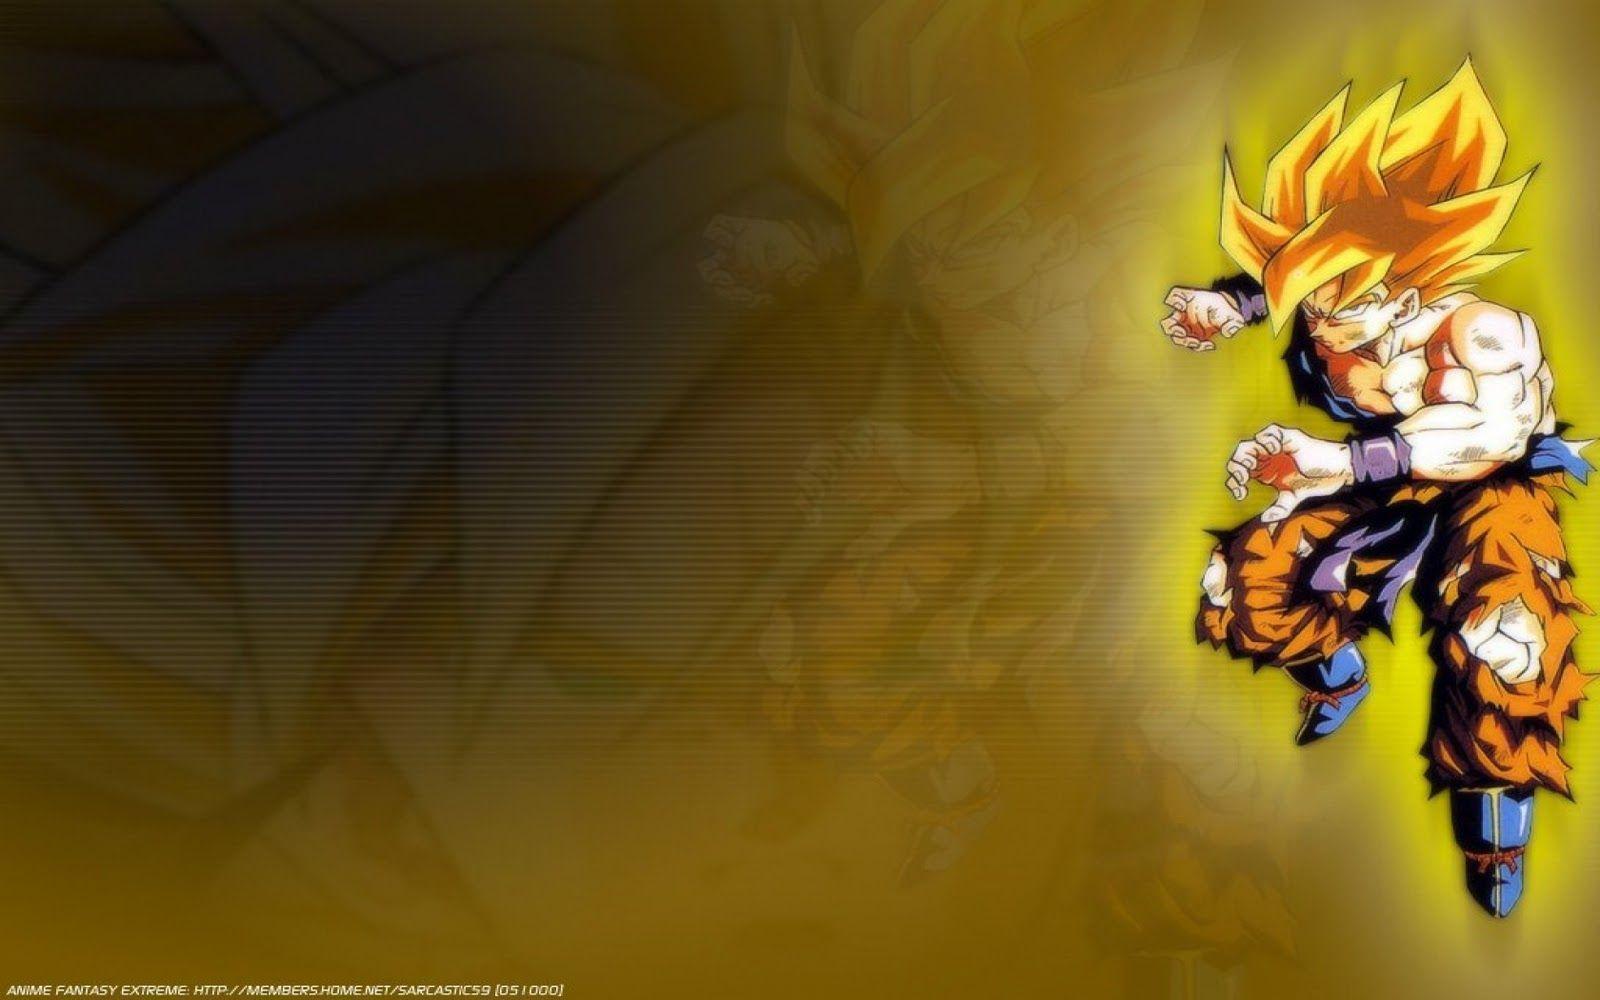 Goku Wallpaper - Viewing Gallery